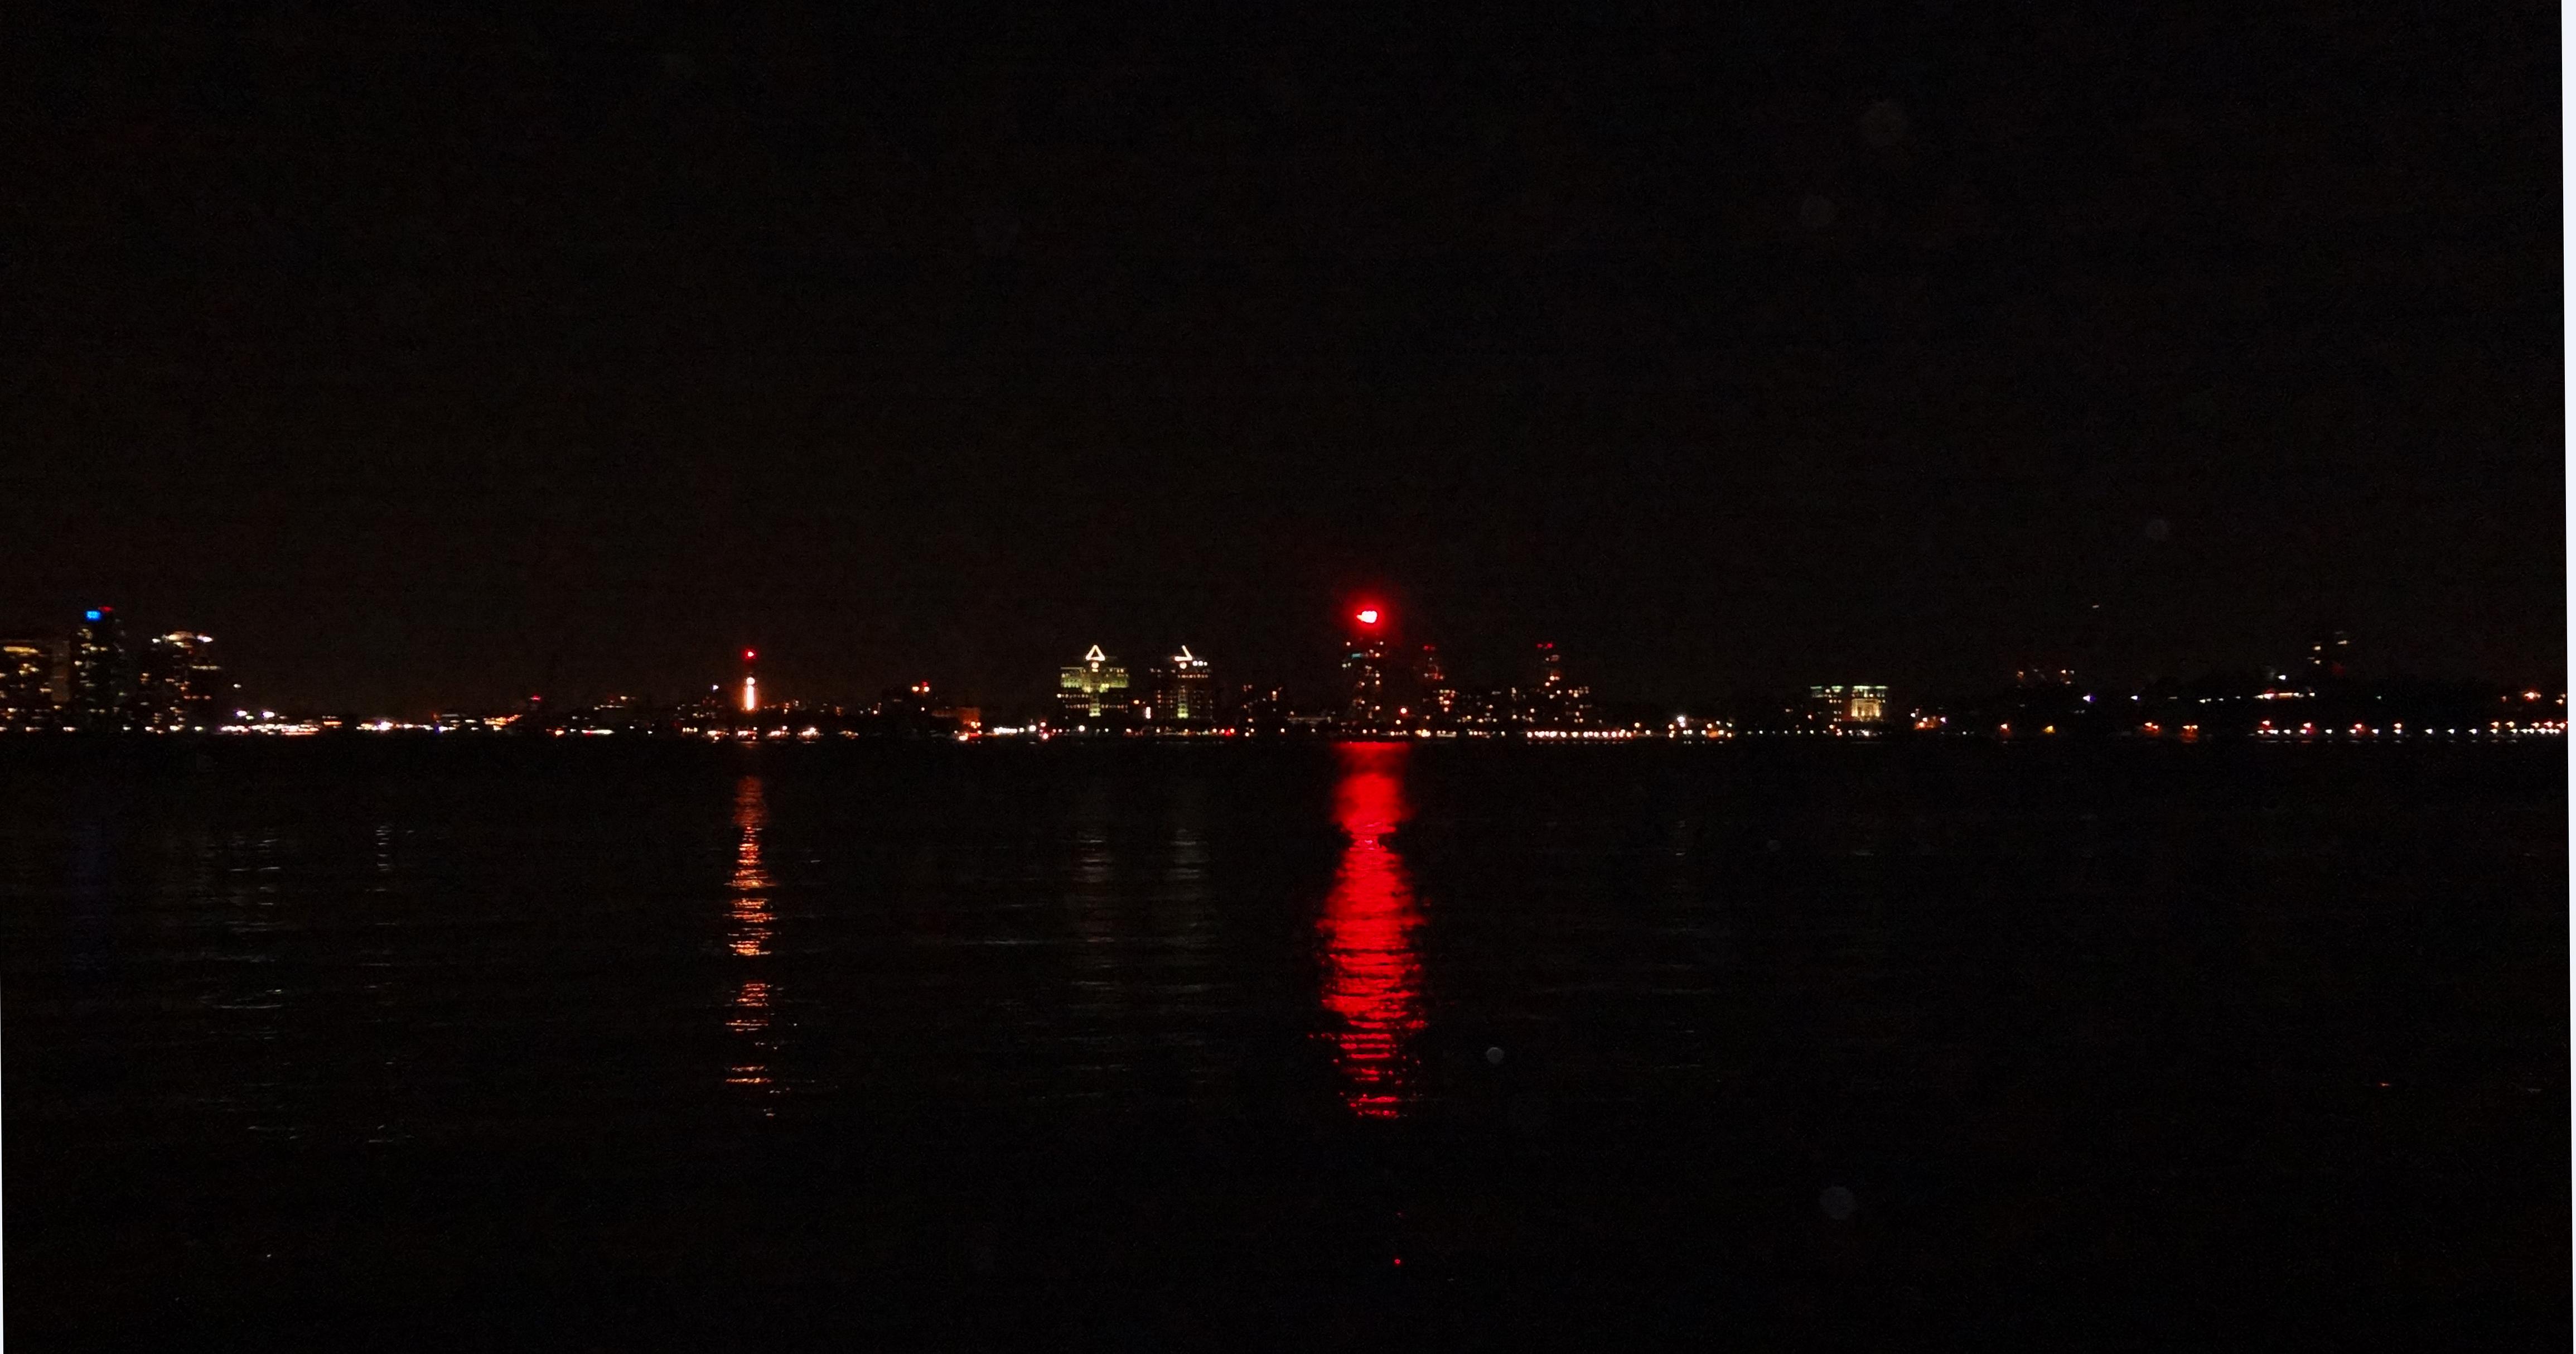 Jersey City W hotel reflection 8-16-2013